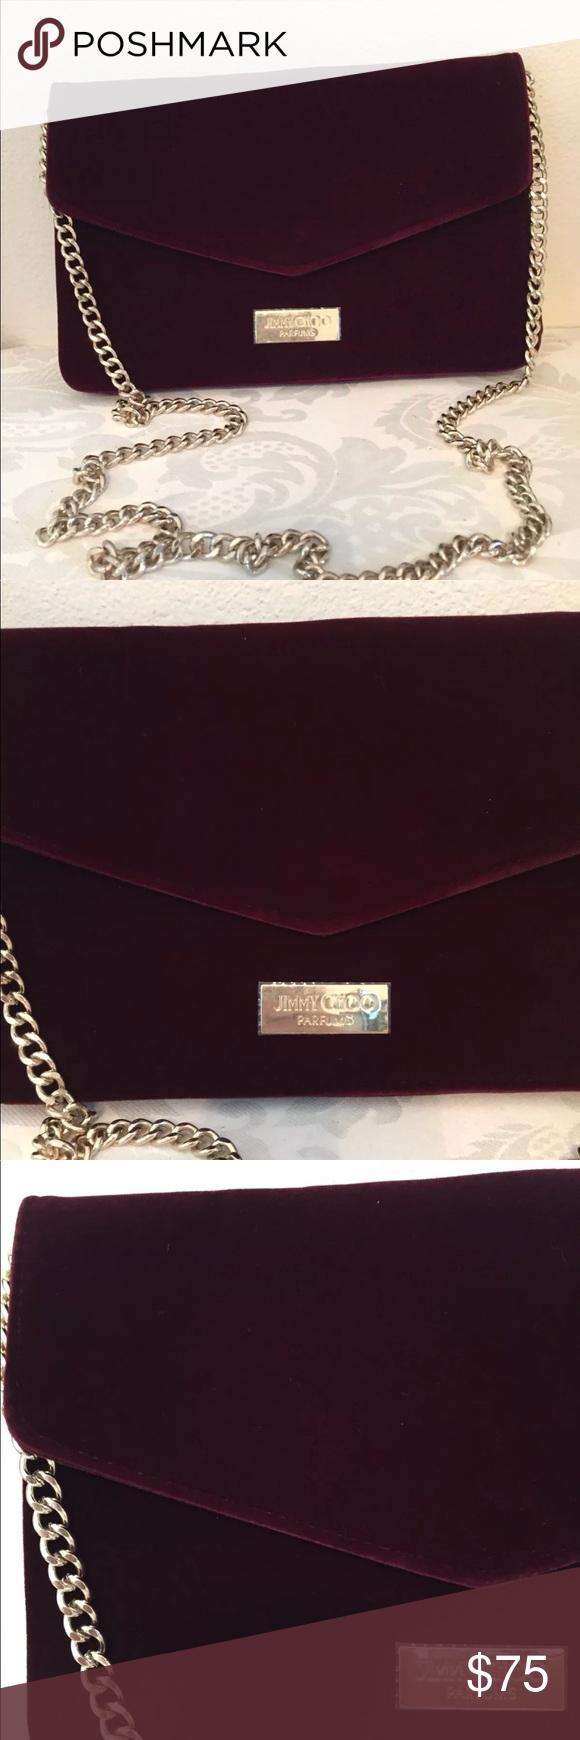 84bbed79e93 Jimmy Choo cosmetic makeup case purse Brand new jimmy Choo handbag bag ⚠